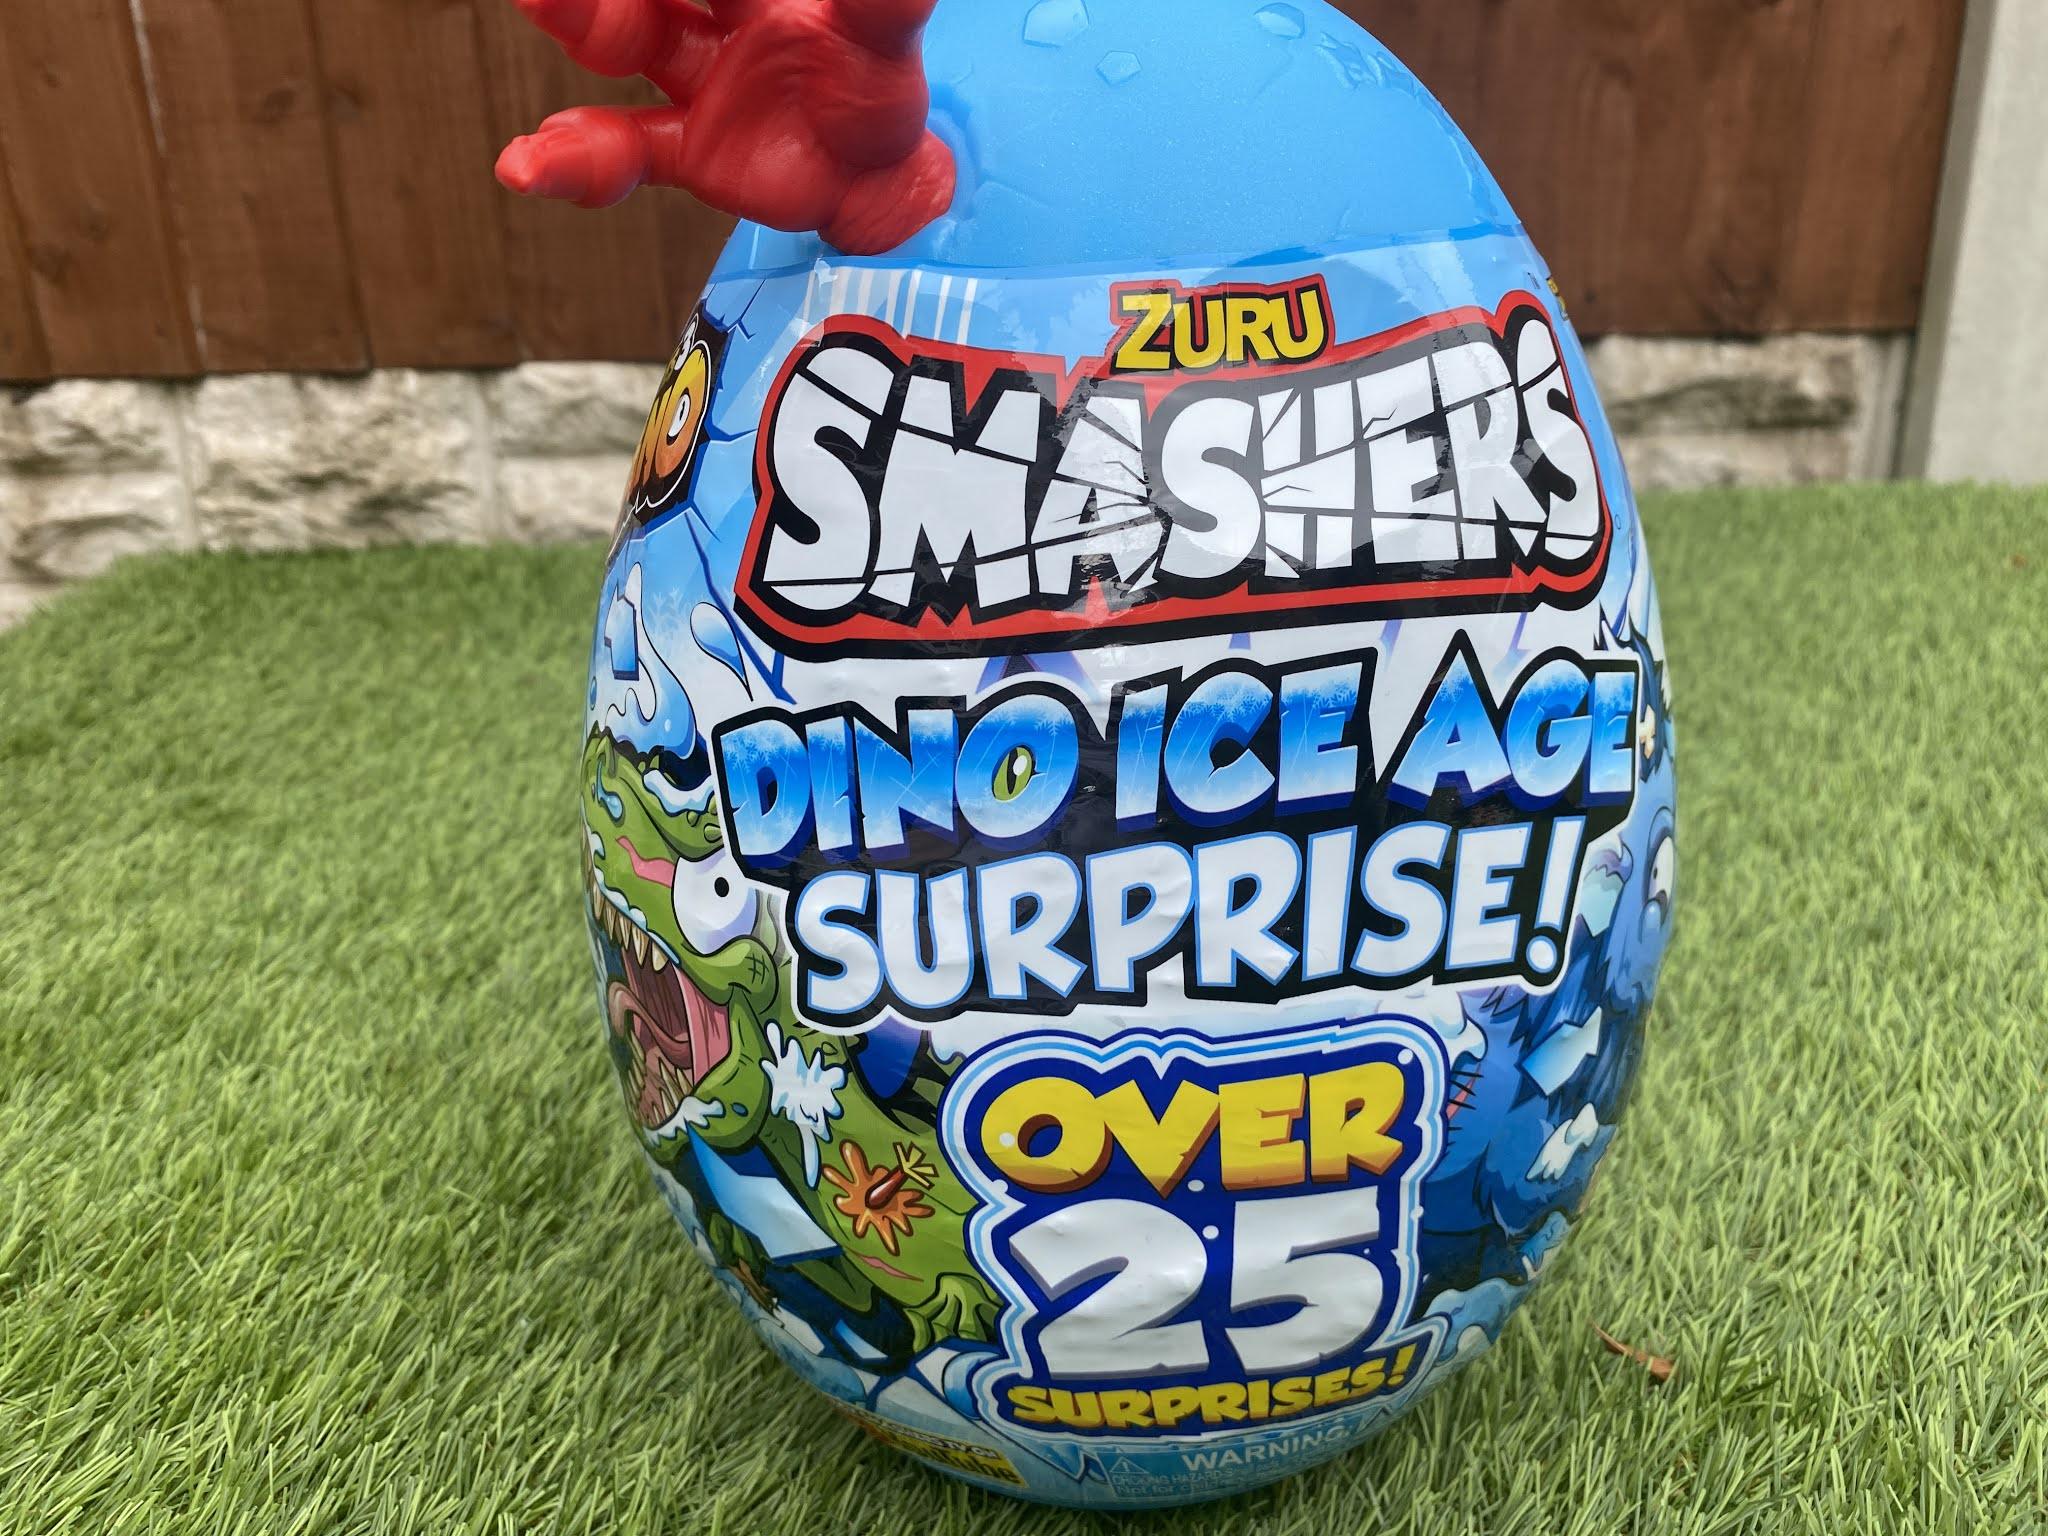 Zuru Smashers Dino Ice Age Surprise